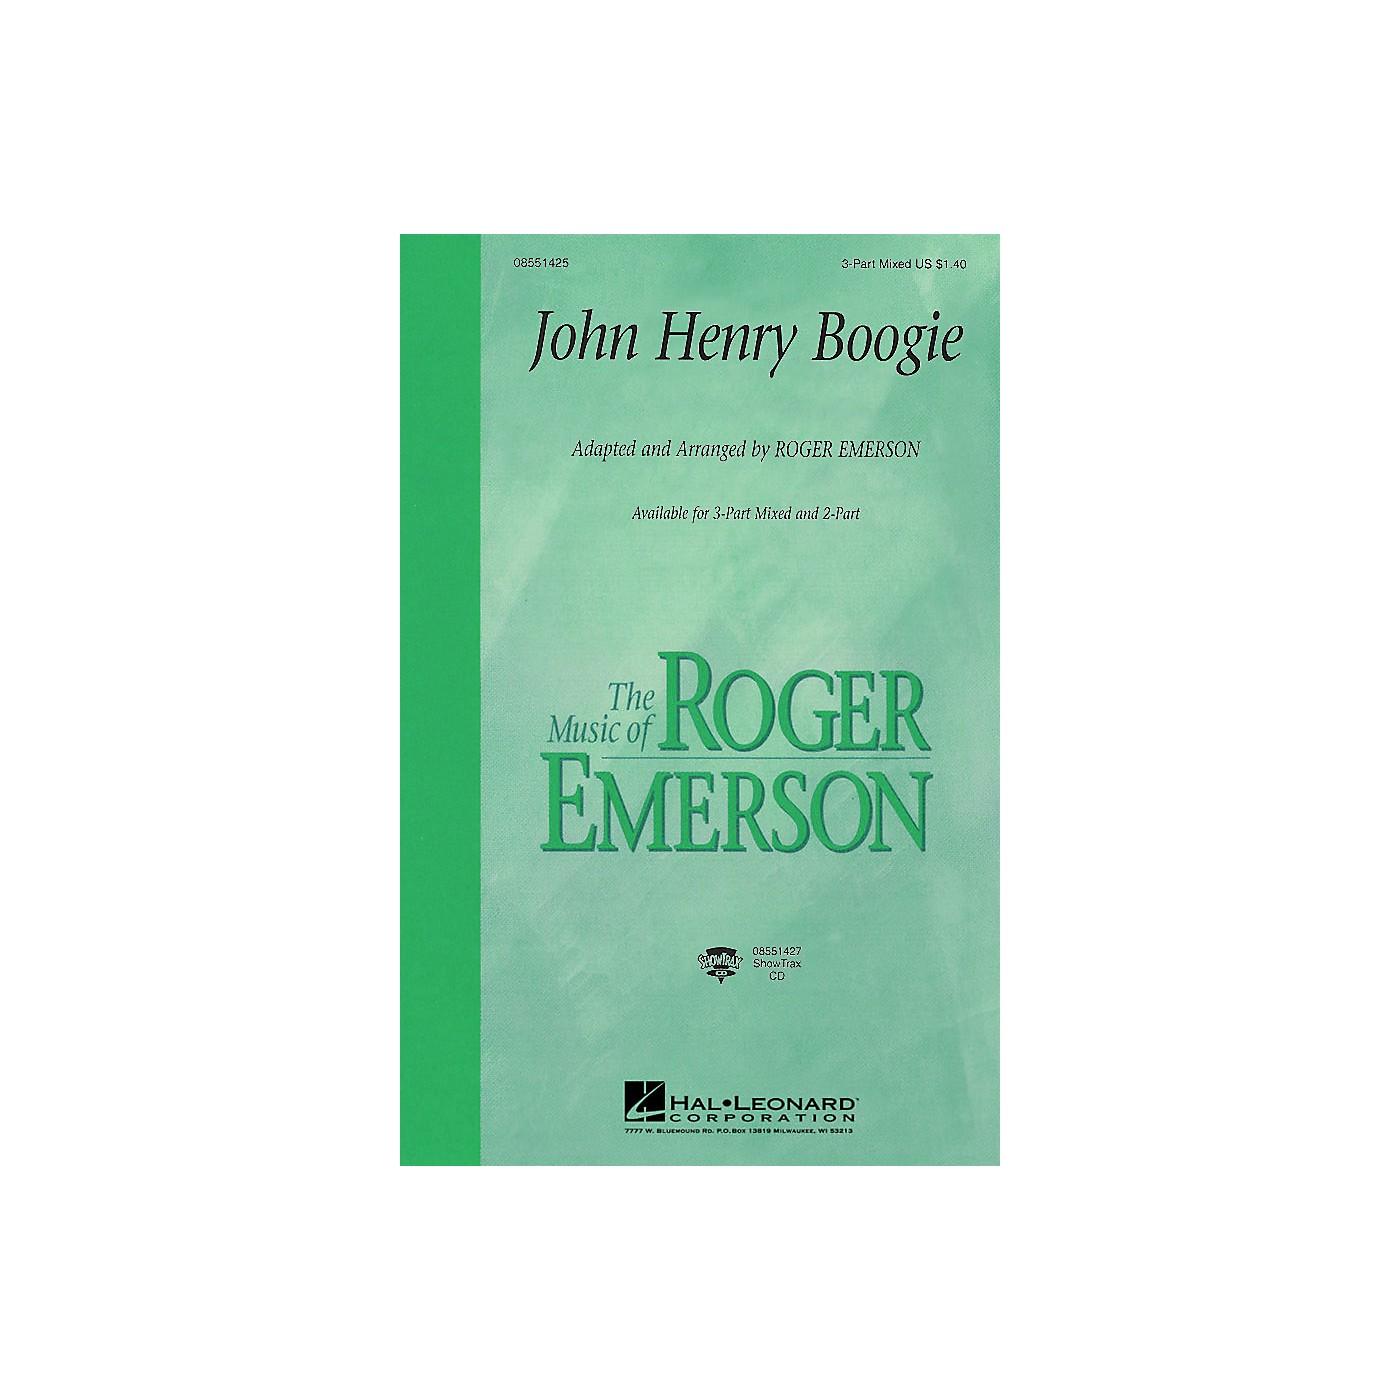 Hal Leonard John Henry Boogie 3-Part Mixed arranged by Roger Emerson thumbnail